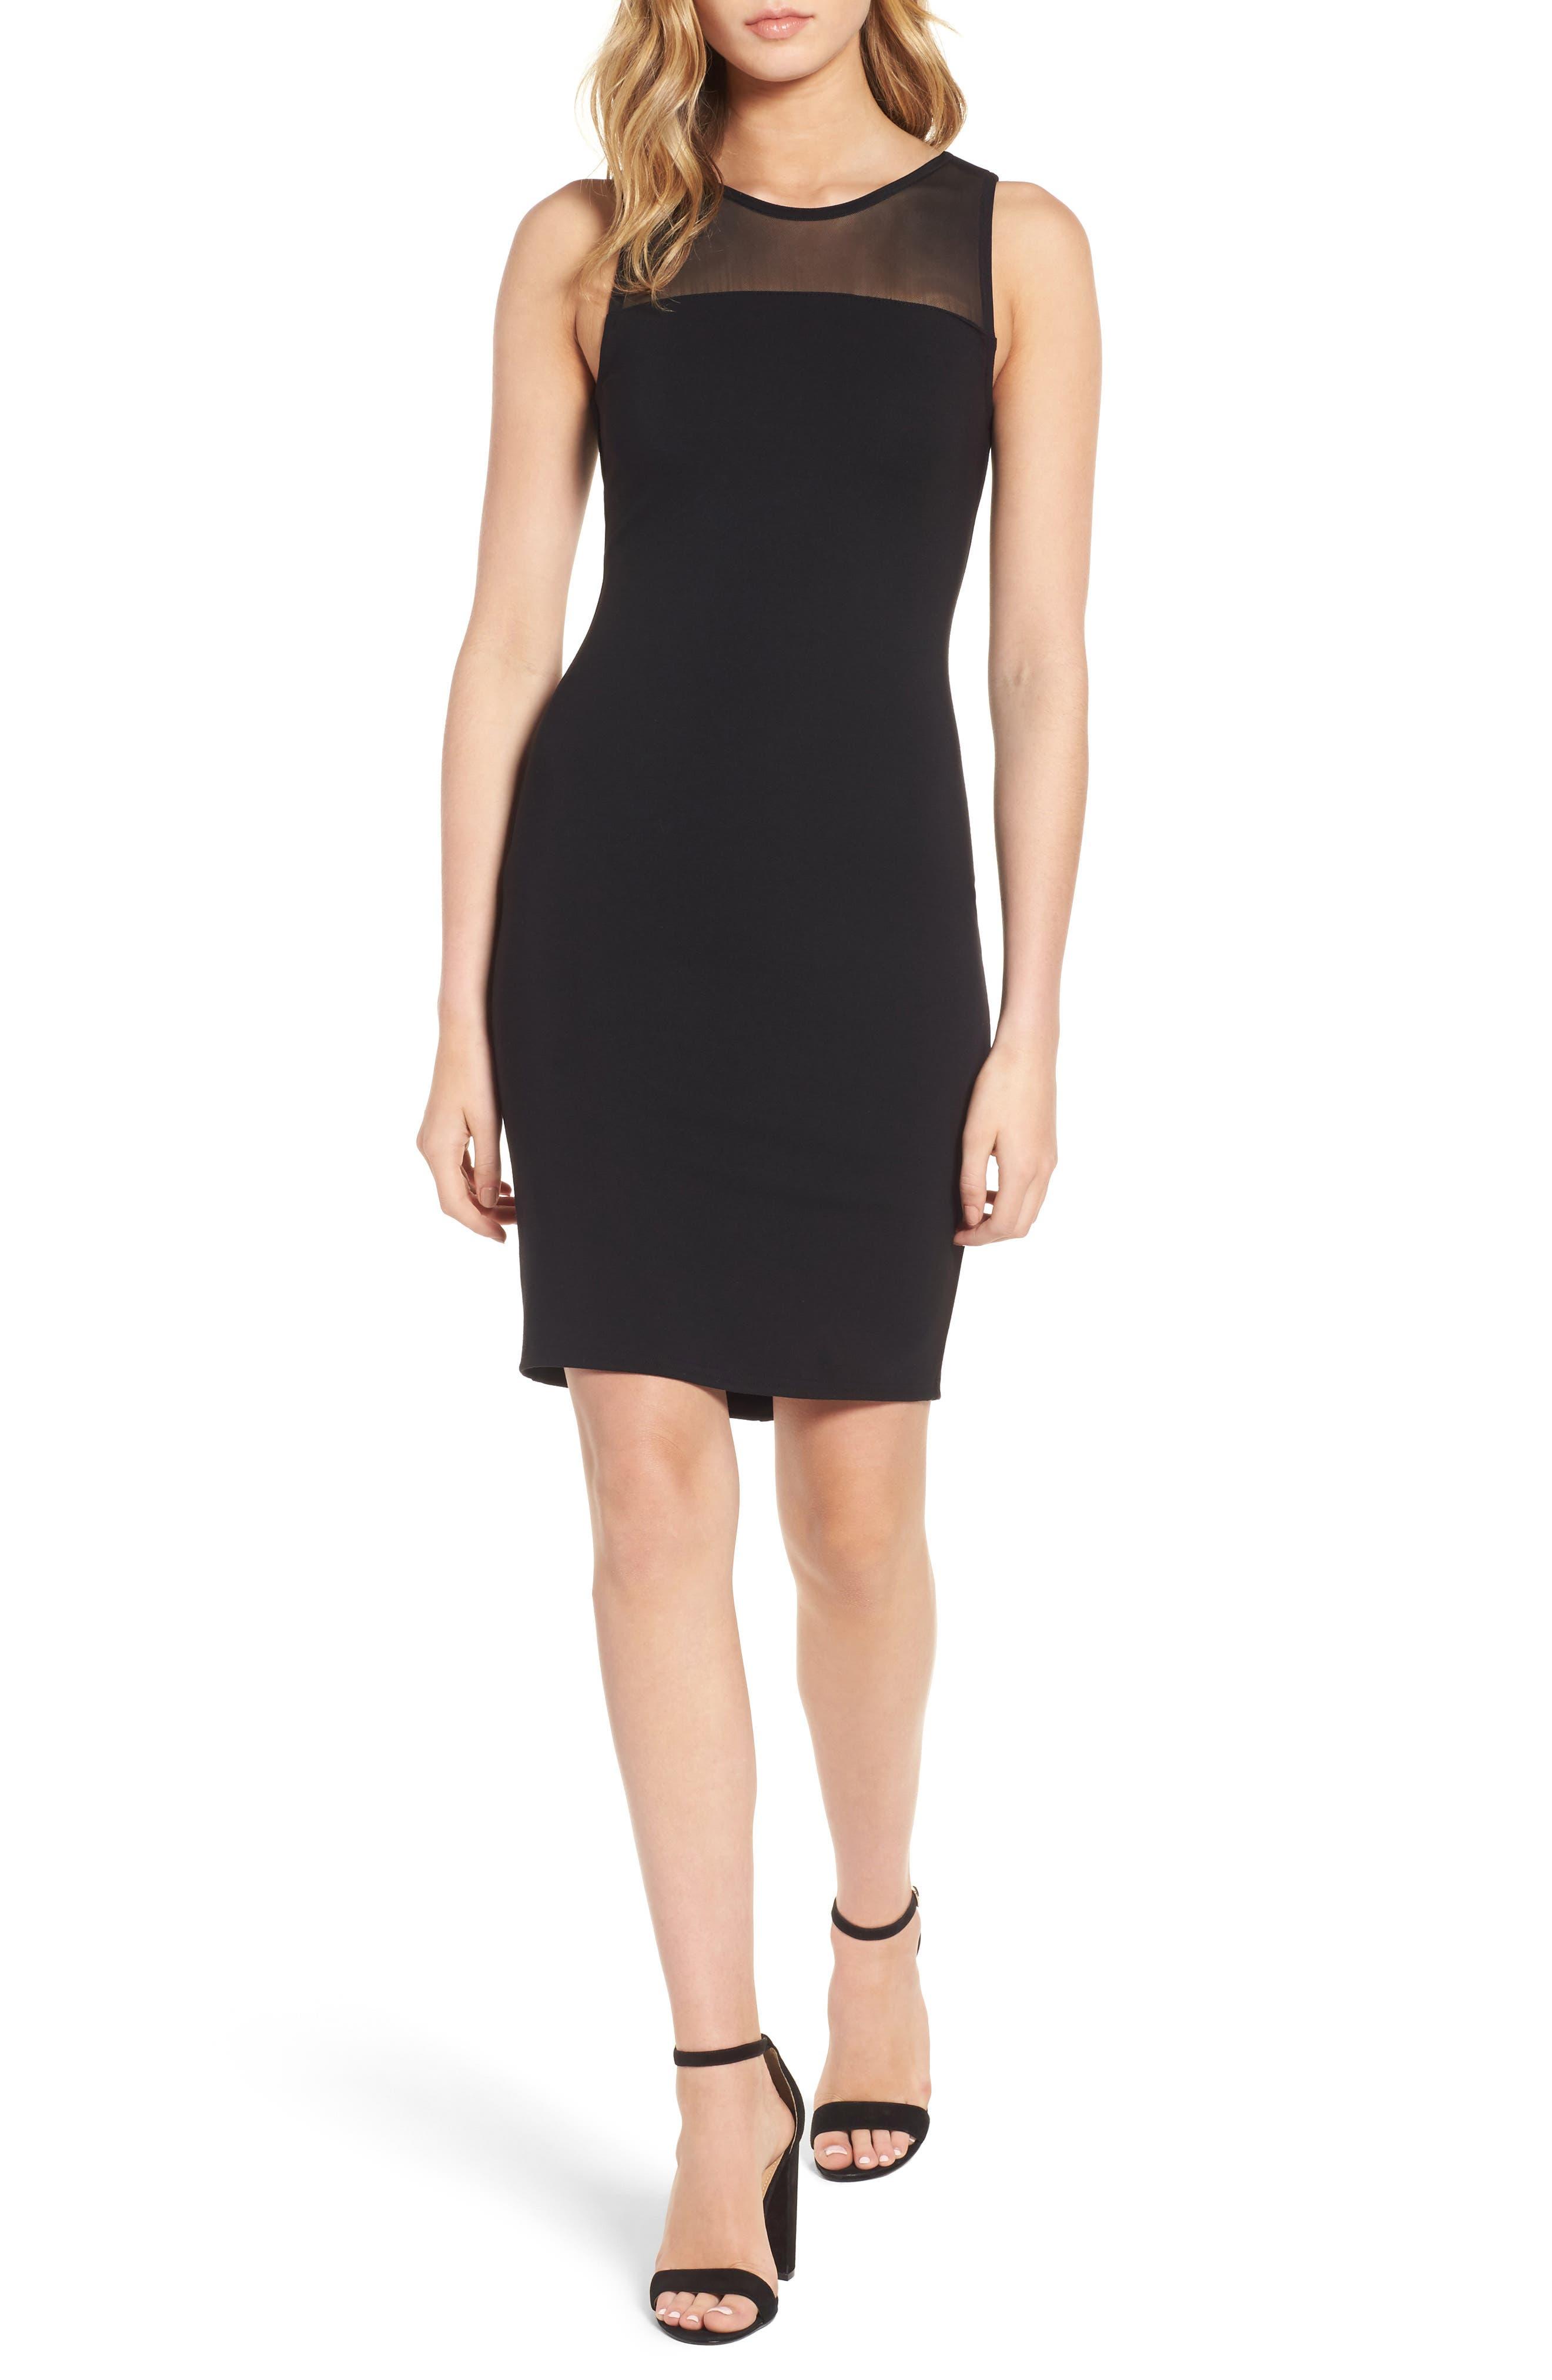 Main Image - Sentimental NY Mesh Inset Body-Con Dress